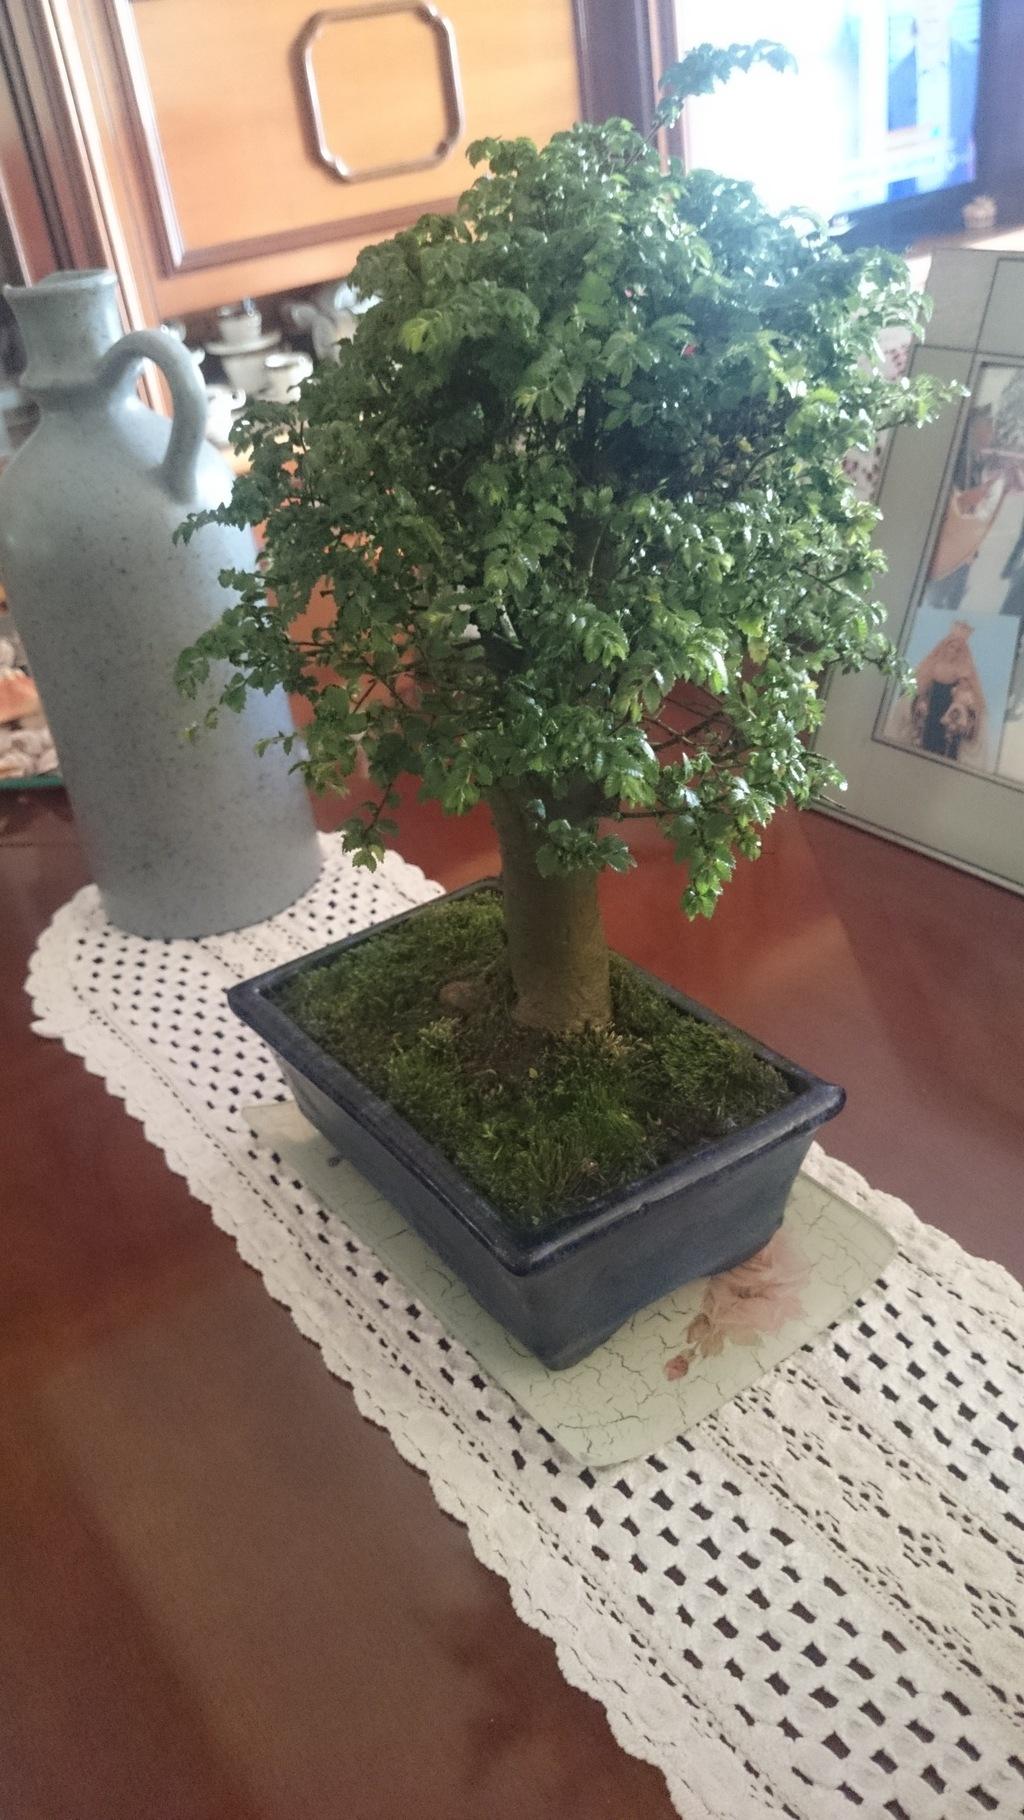 ayuda con mi primer bonsai DSC_4184_zps7emnoxla